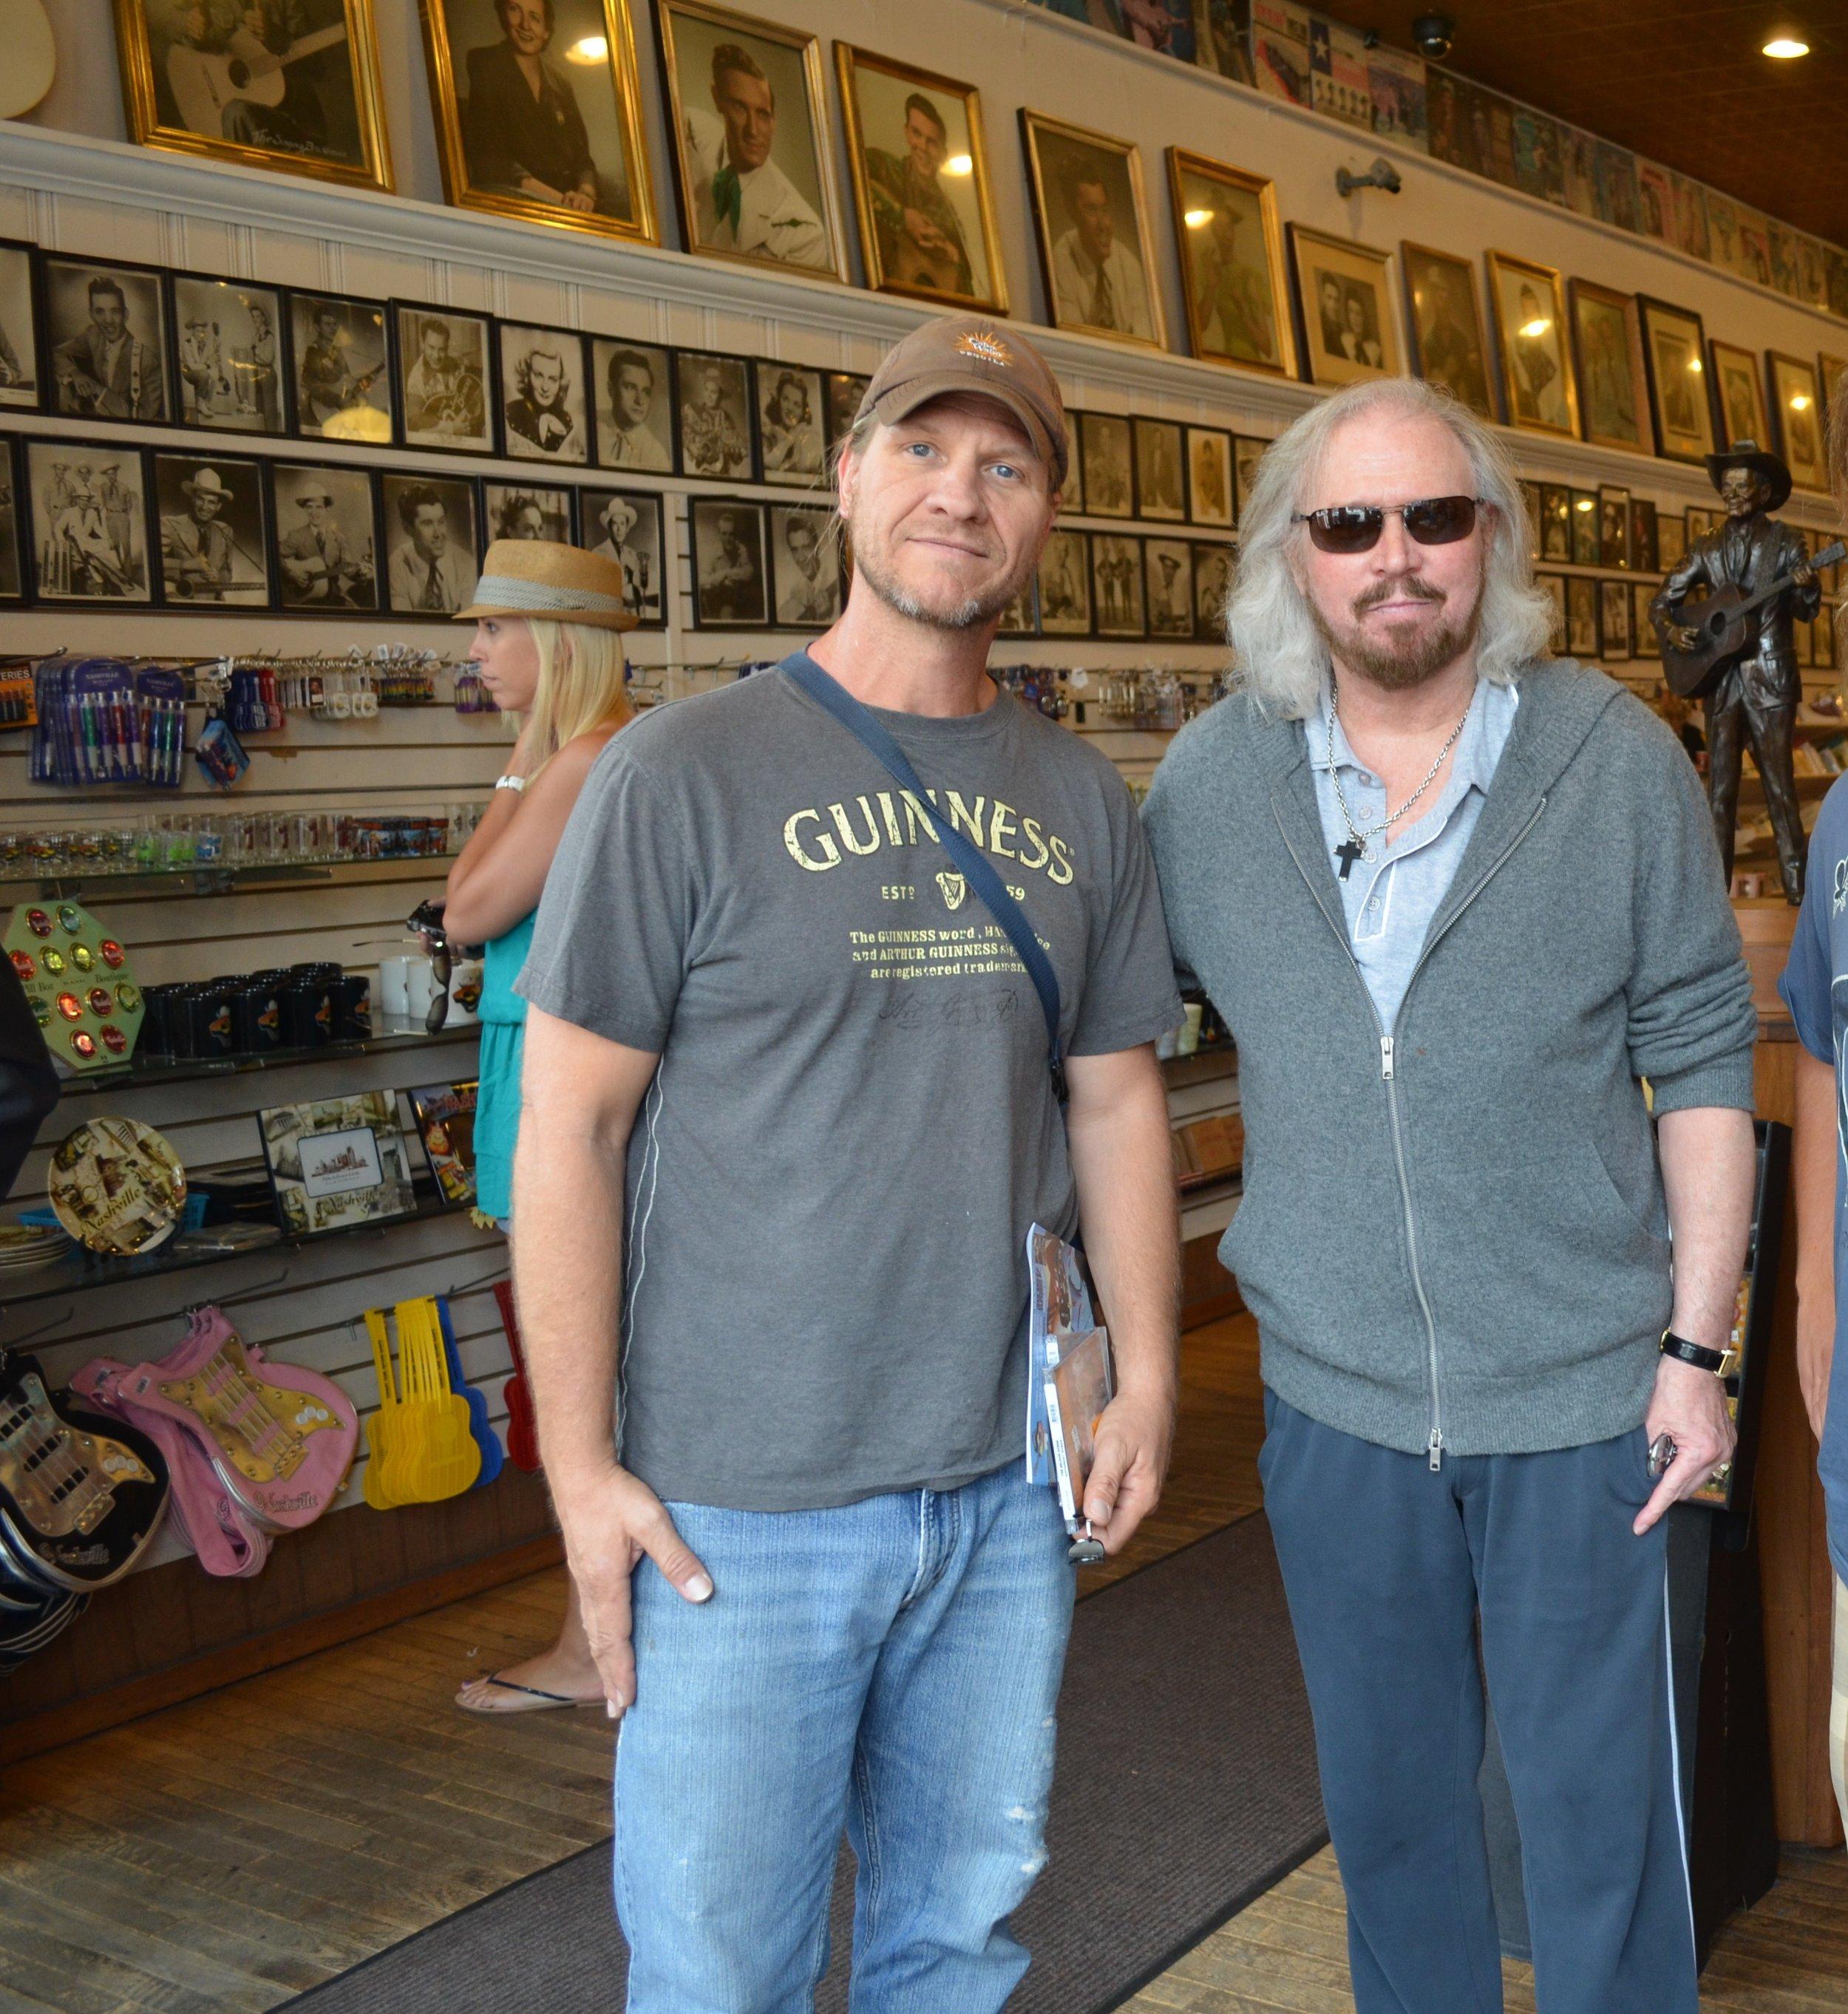 JD PRIEST & Barry Gibb in Nashville TN 2012.JPG